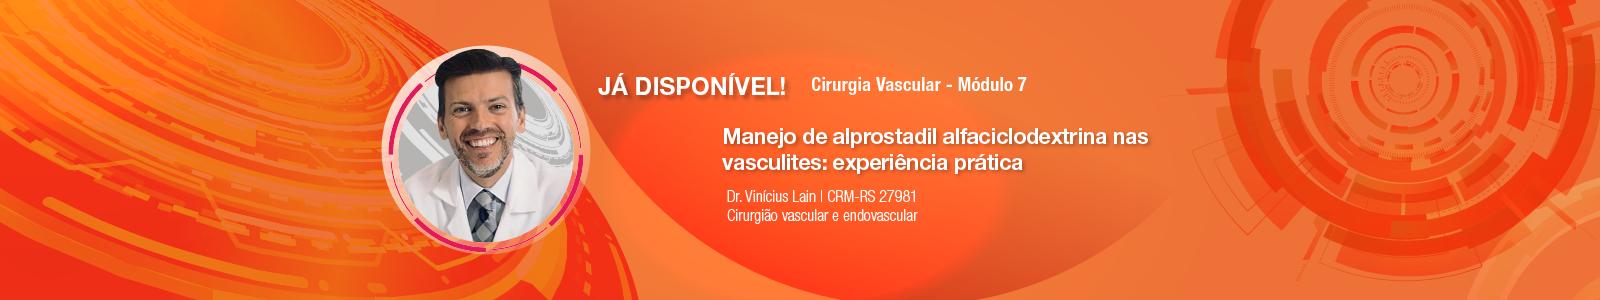 Visão Aché2021-banners vascular-1 3